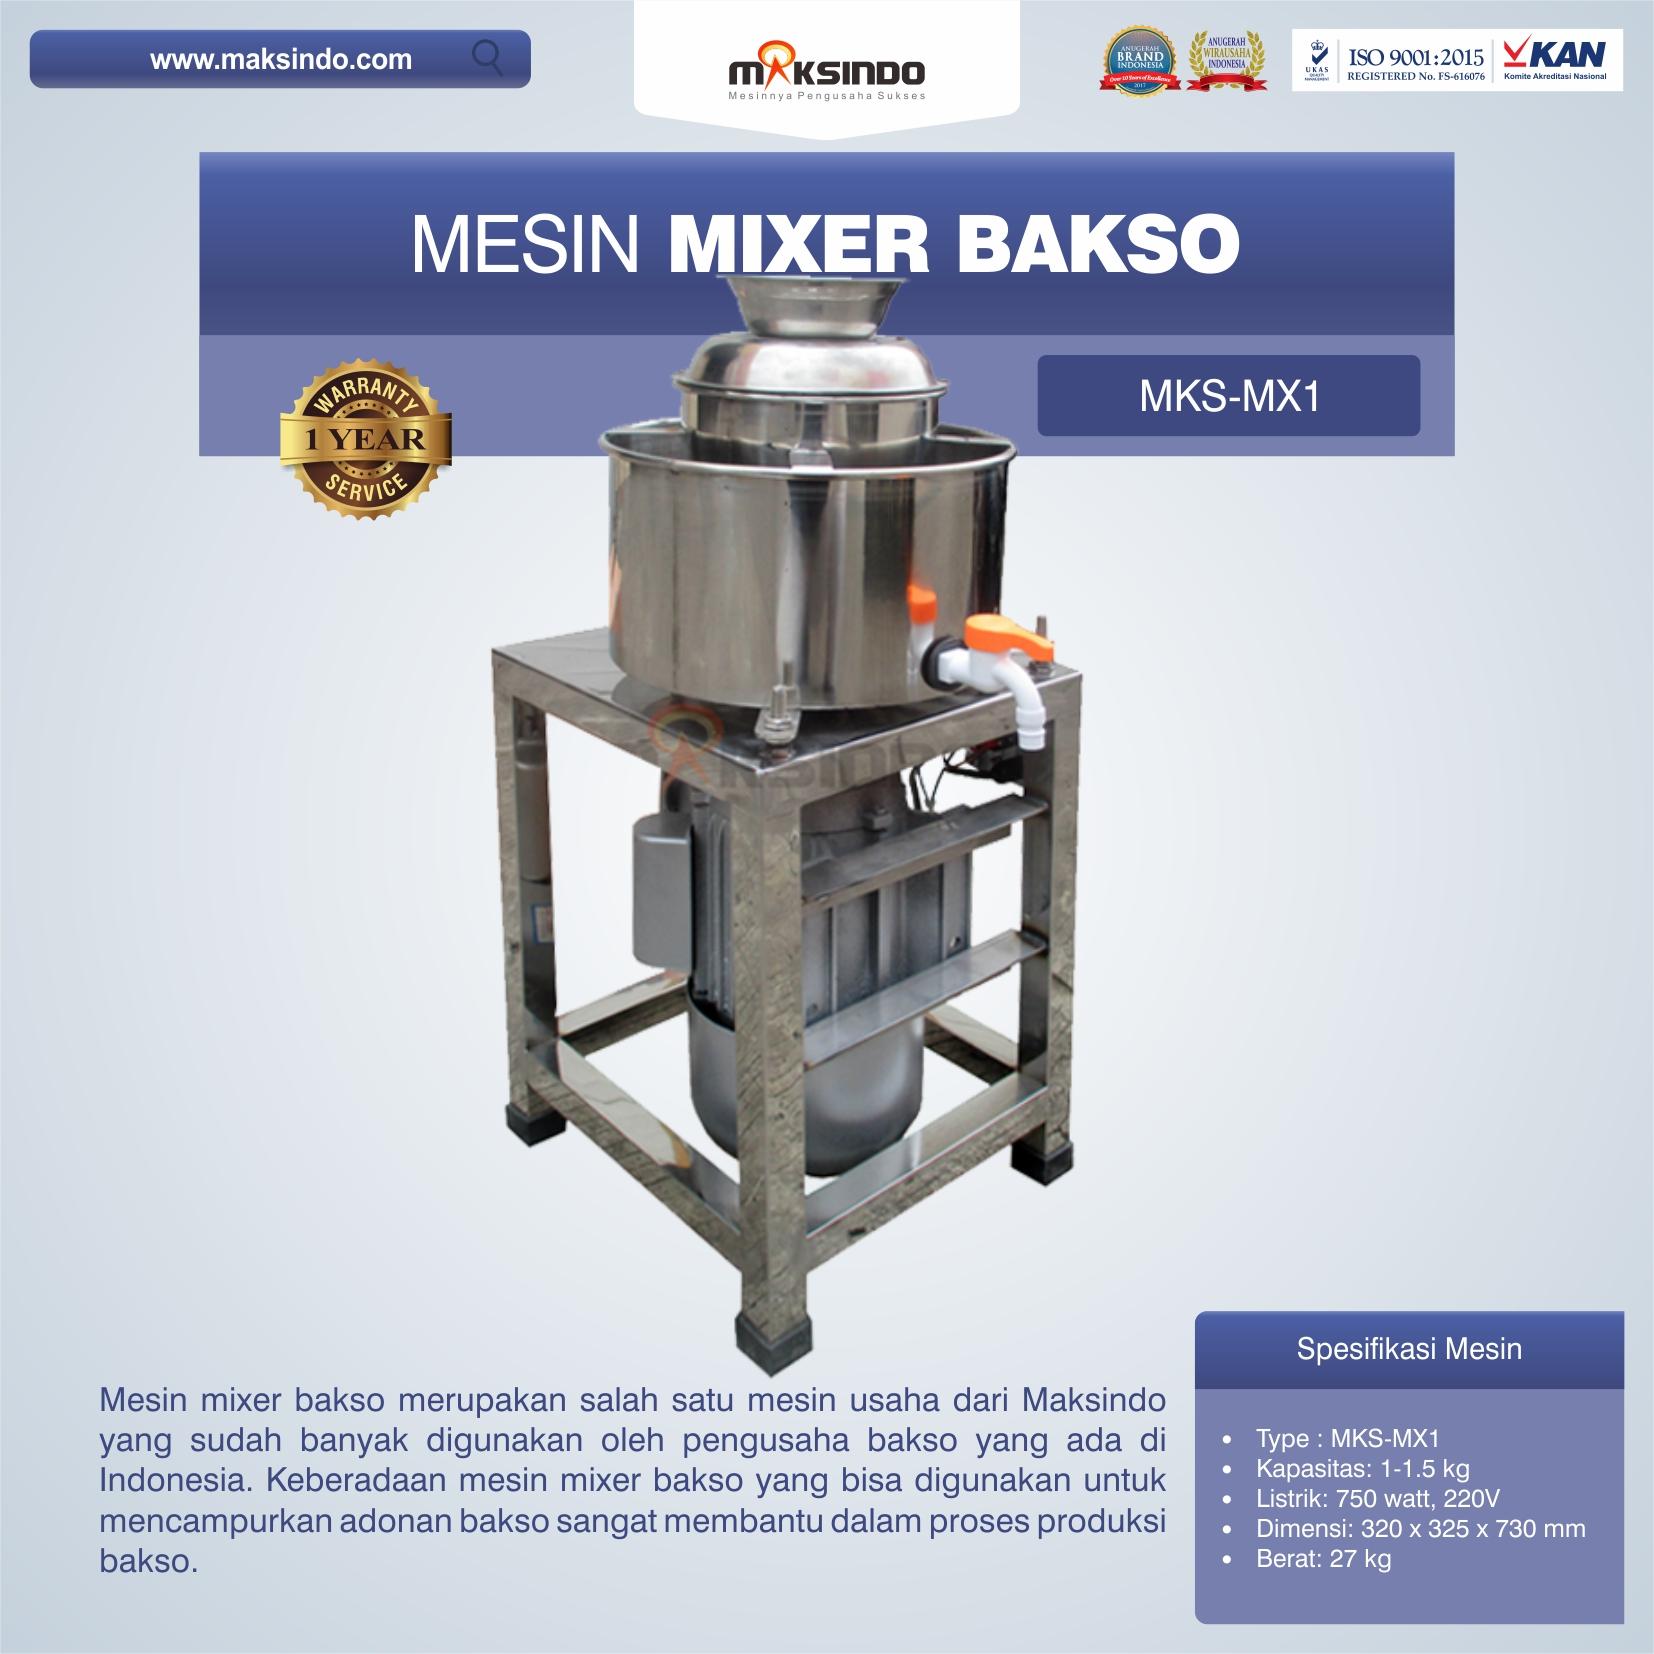 Jual Mesin Mixer Bakso MKS-MX1 di Bekasi